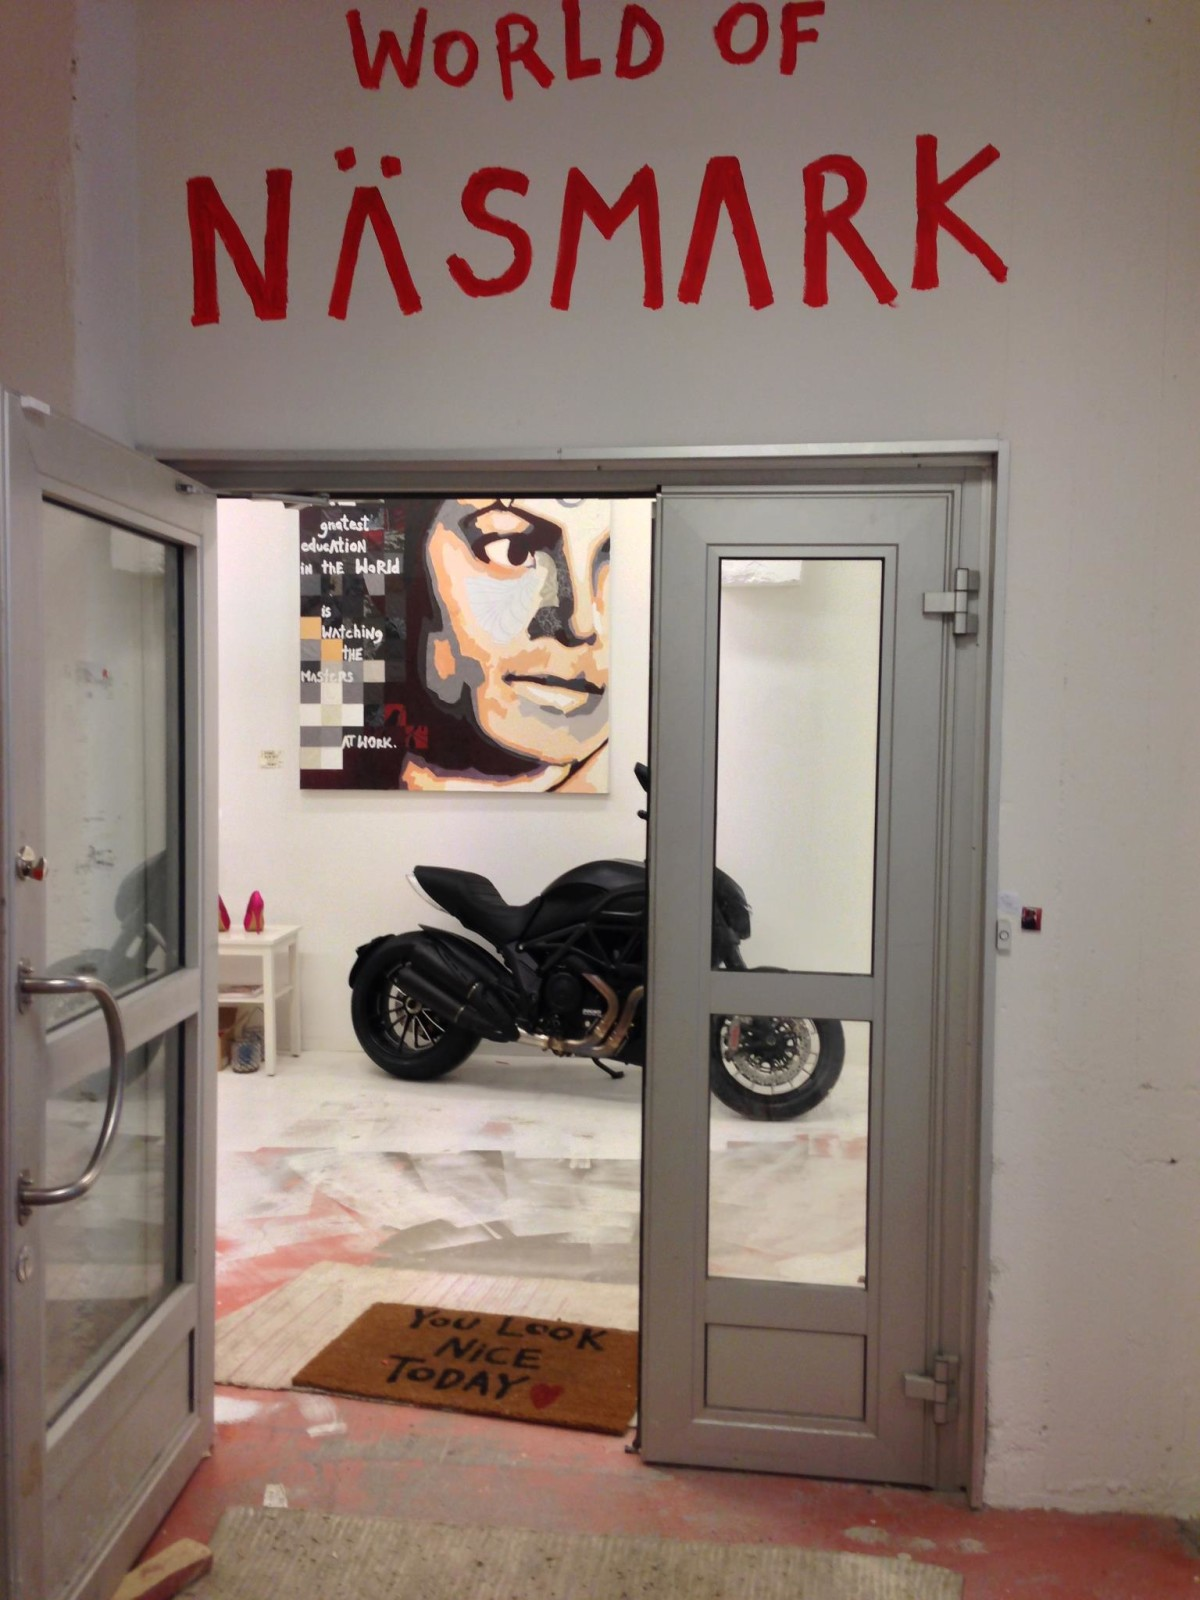 World of Näsmark